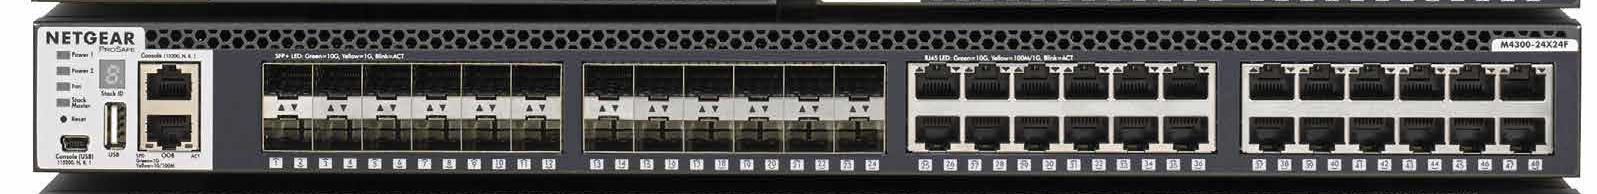 NET.XSM4348S Netgear XSM4348S-100NES   -   M4300-24X24F face avant